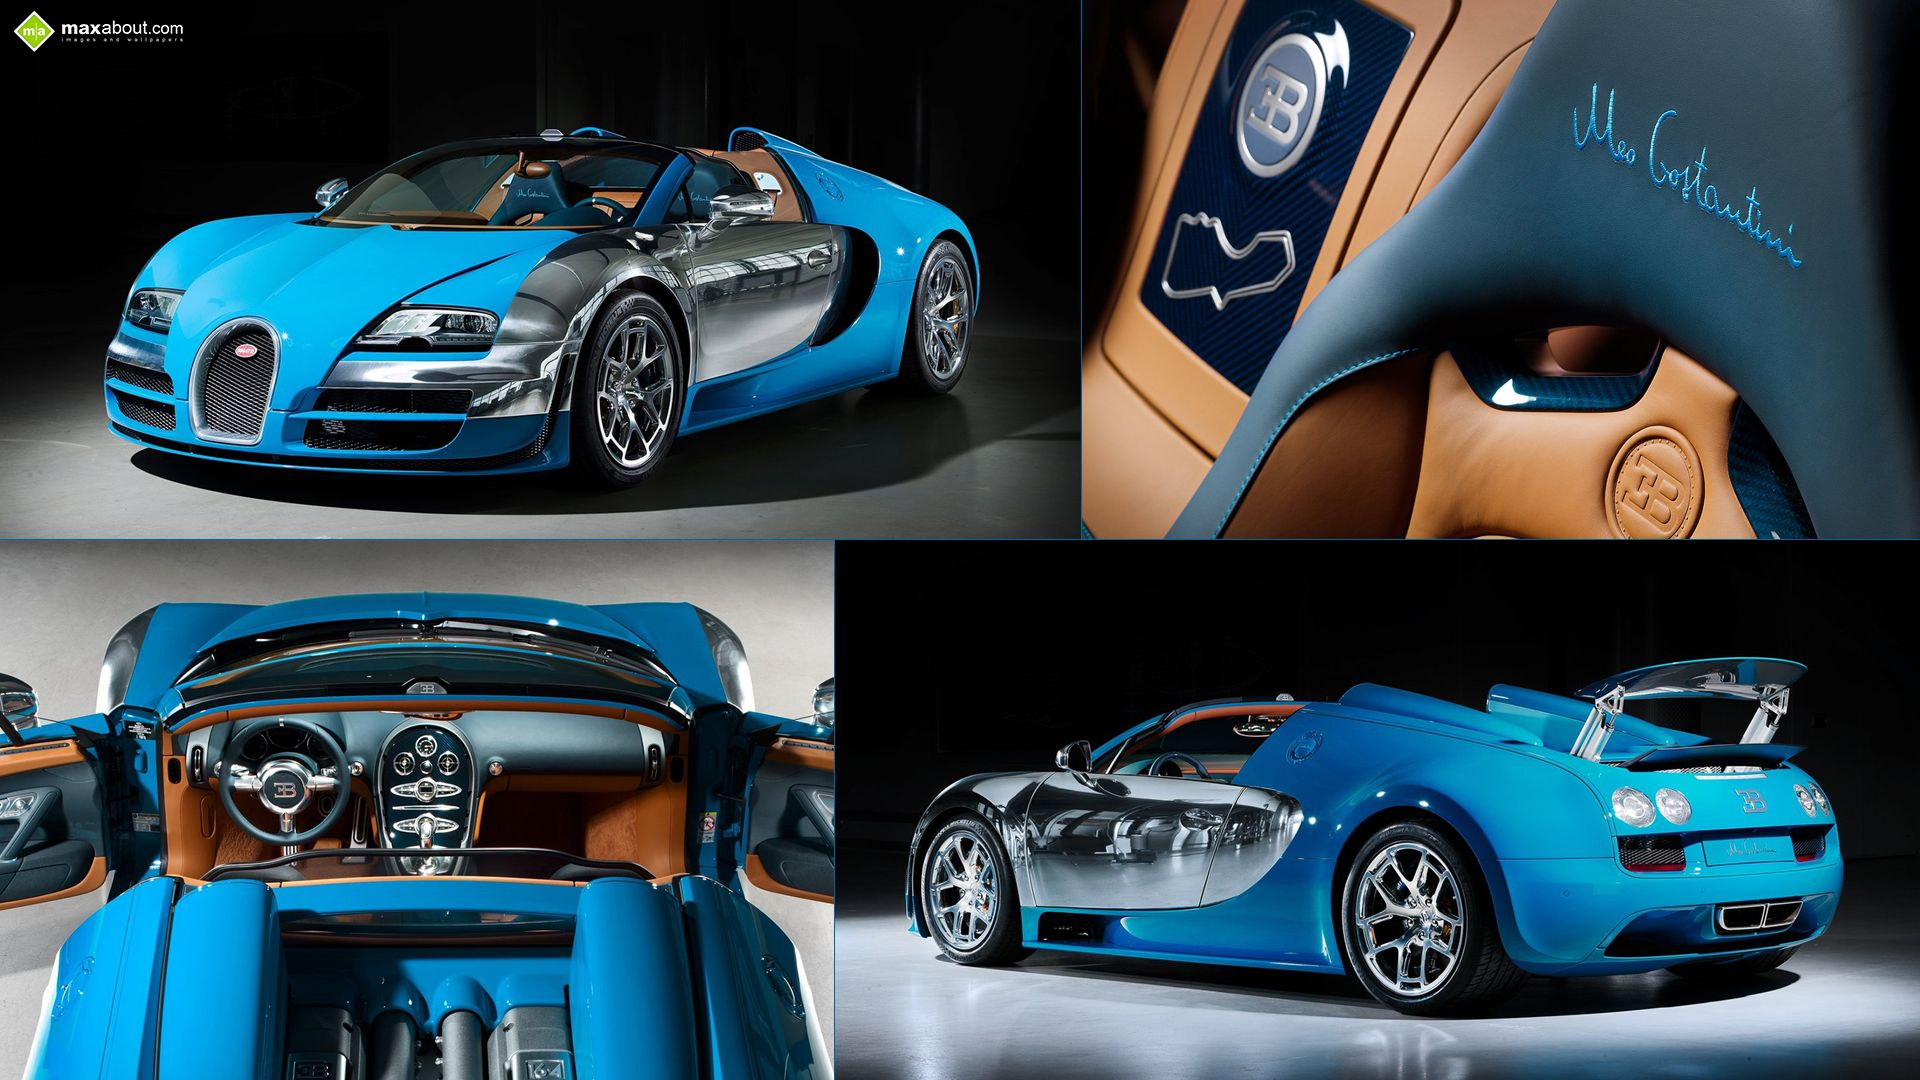 fdb4cfd25e7a944df275b5f5cd56e3d9 Inspiring Bugatti Veyron Quarter Mile Speed Cars Trend